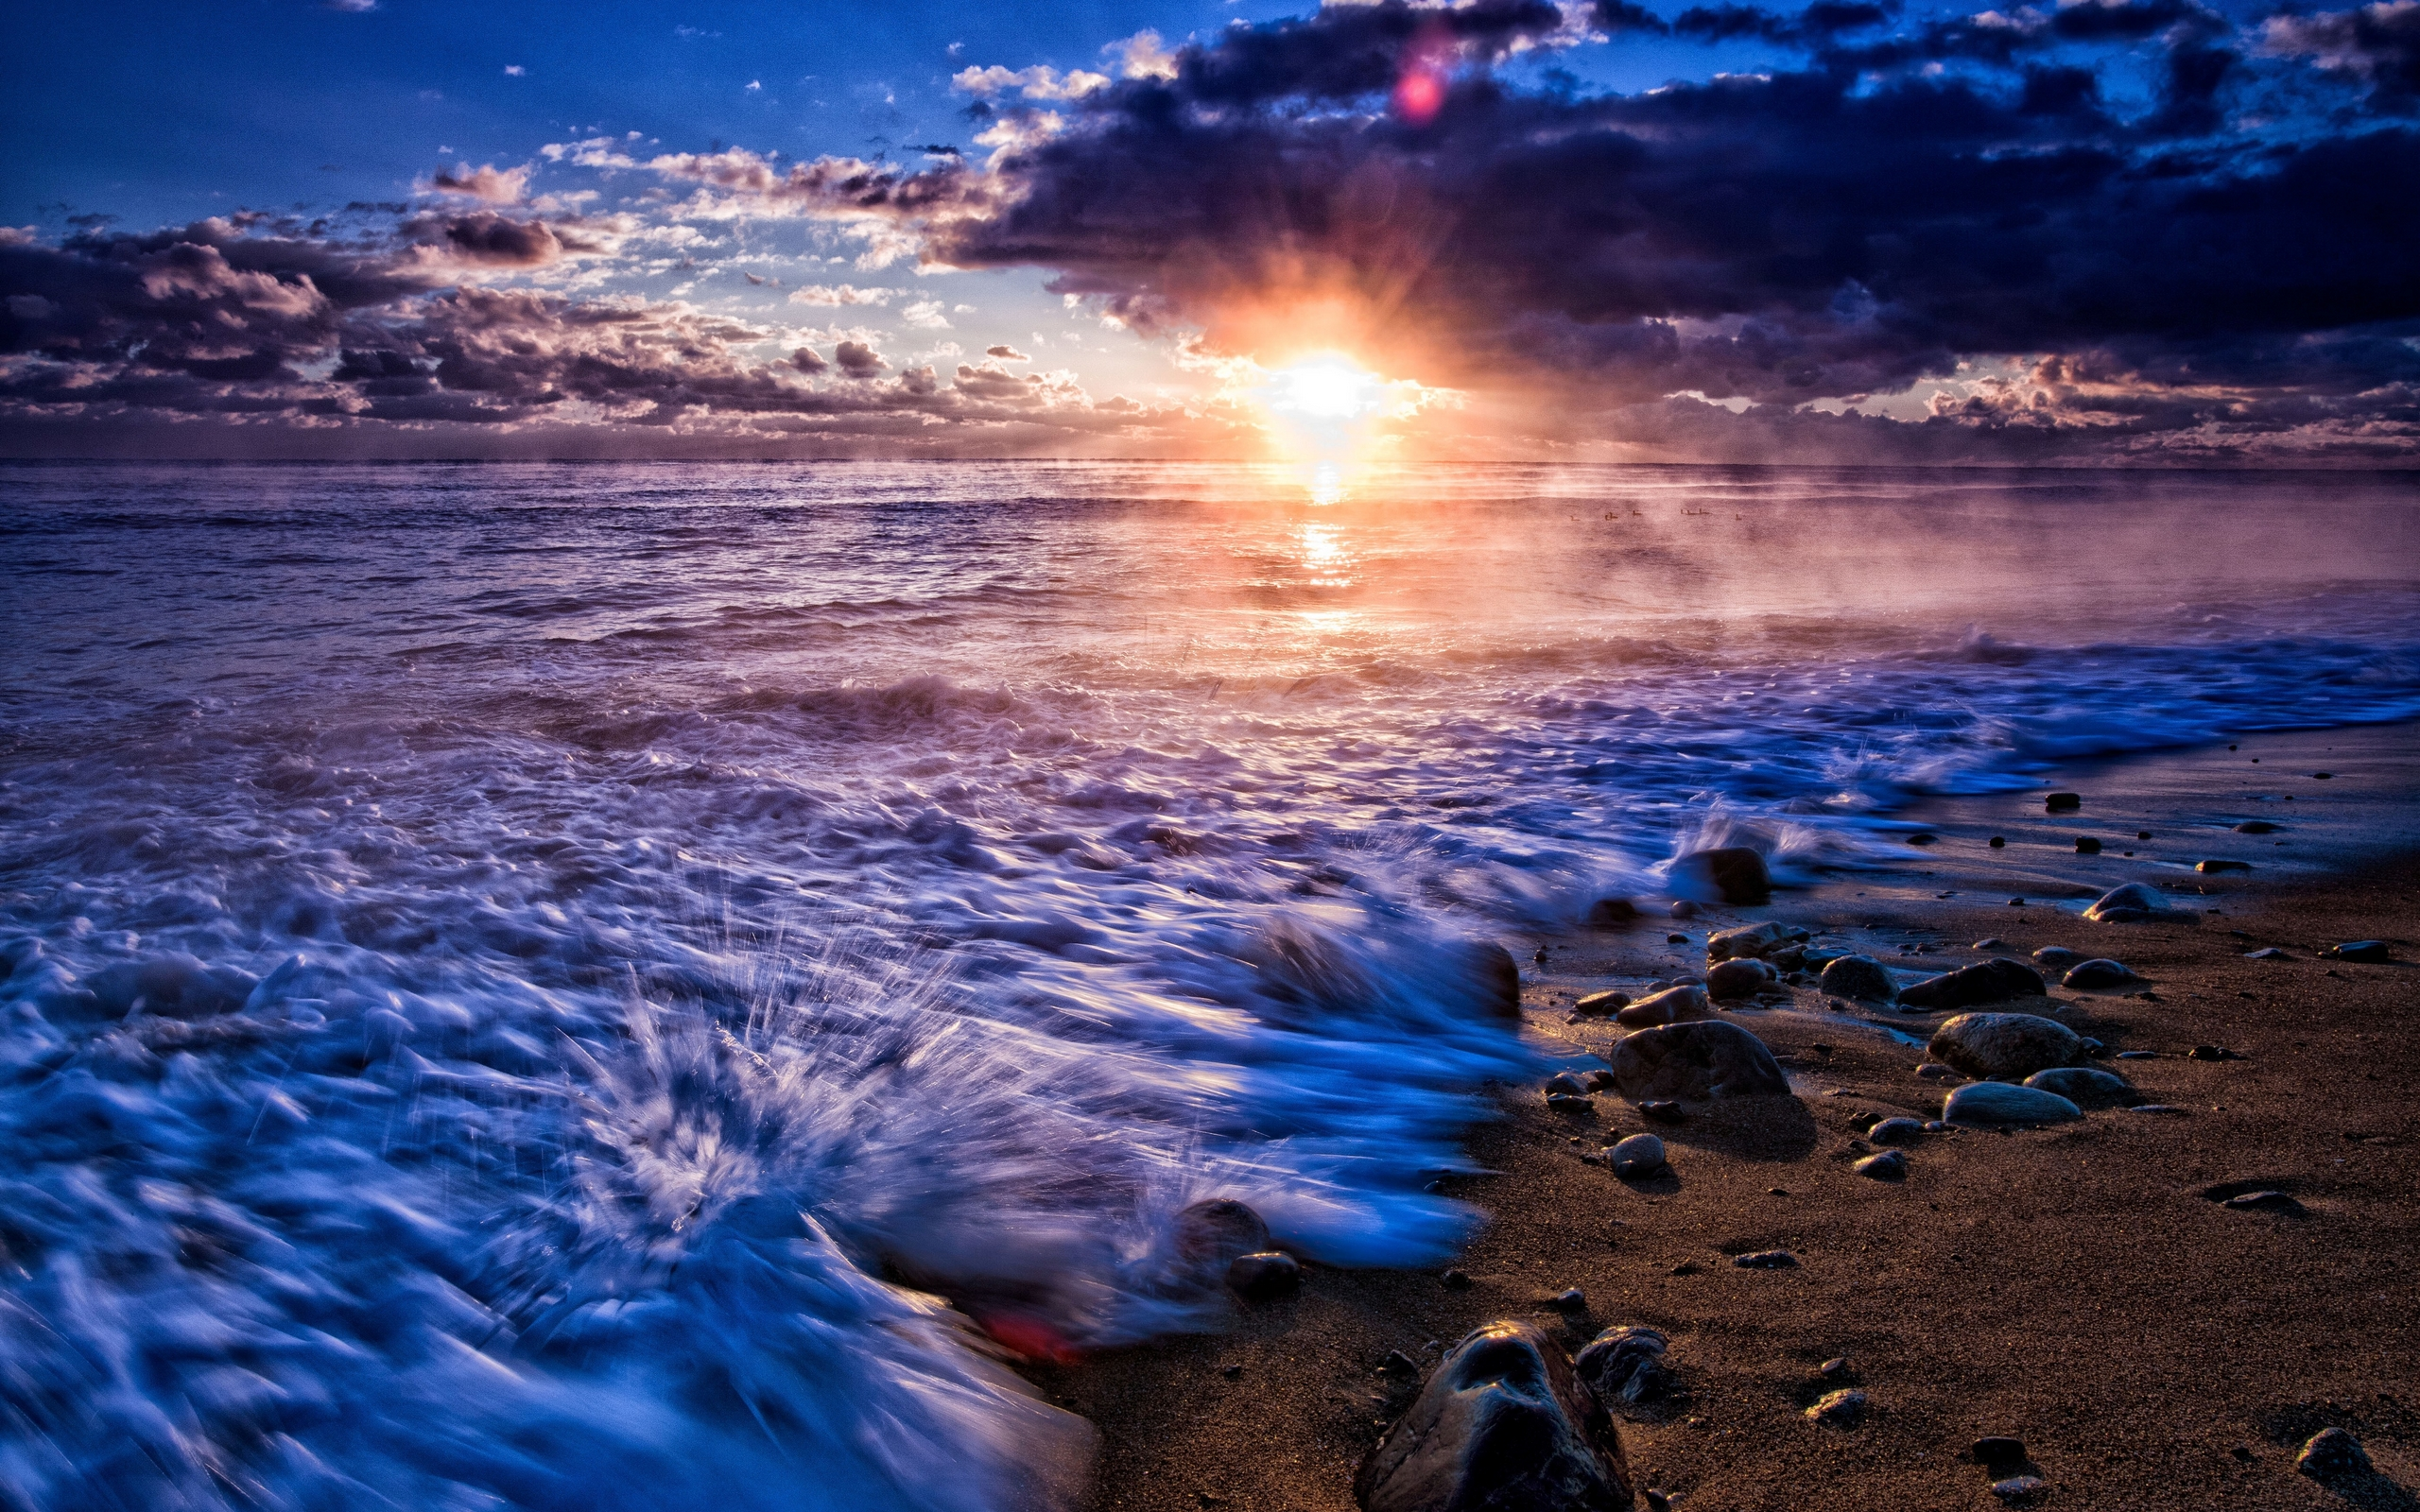 берег, песок, камни